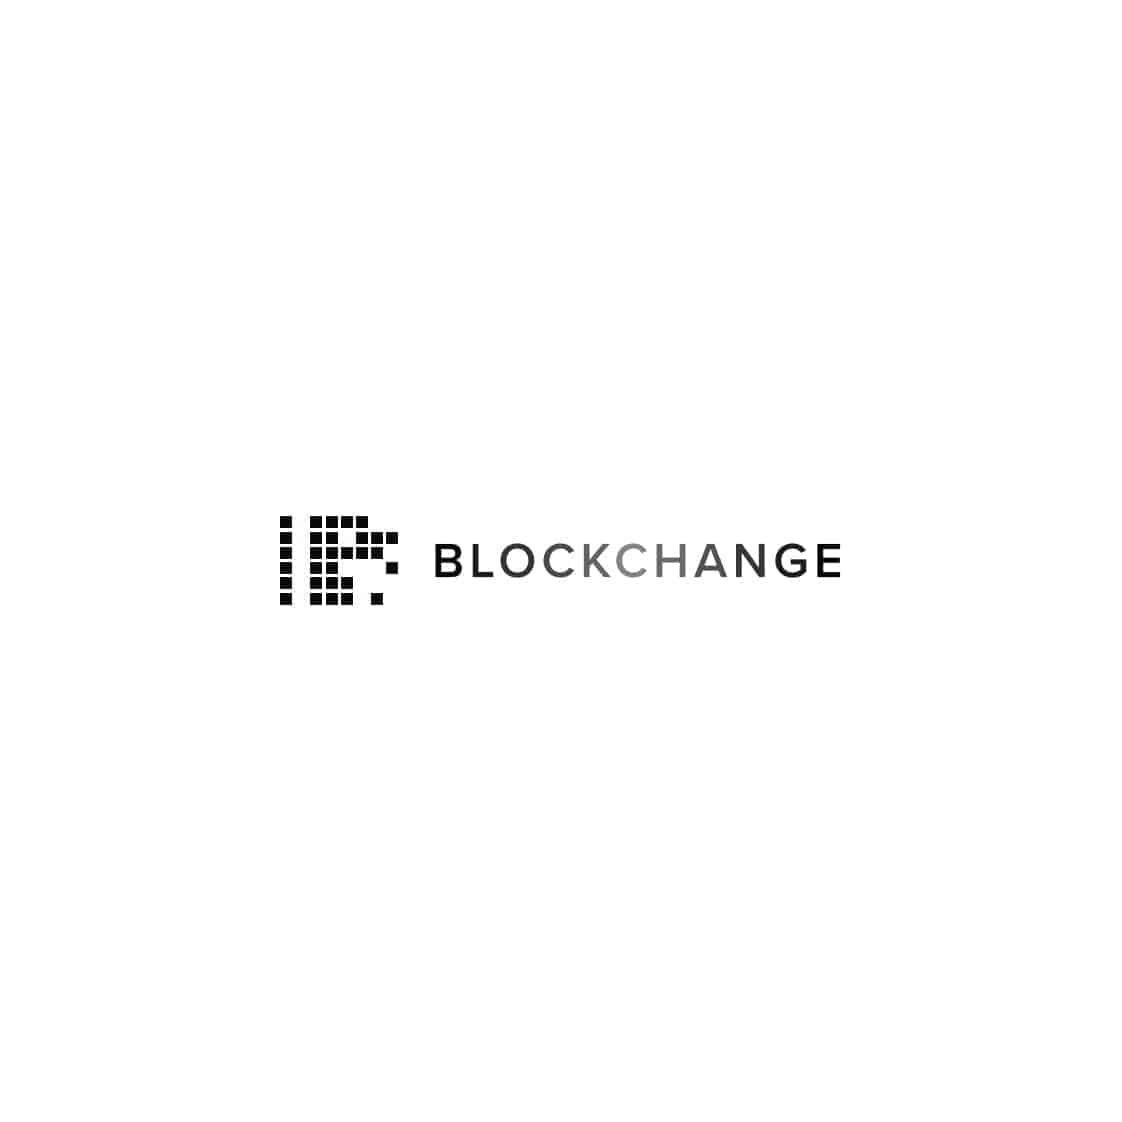 Blockchange logo